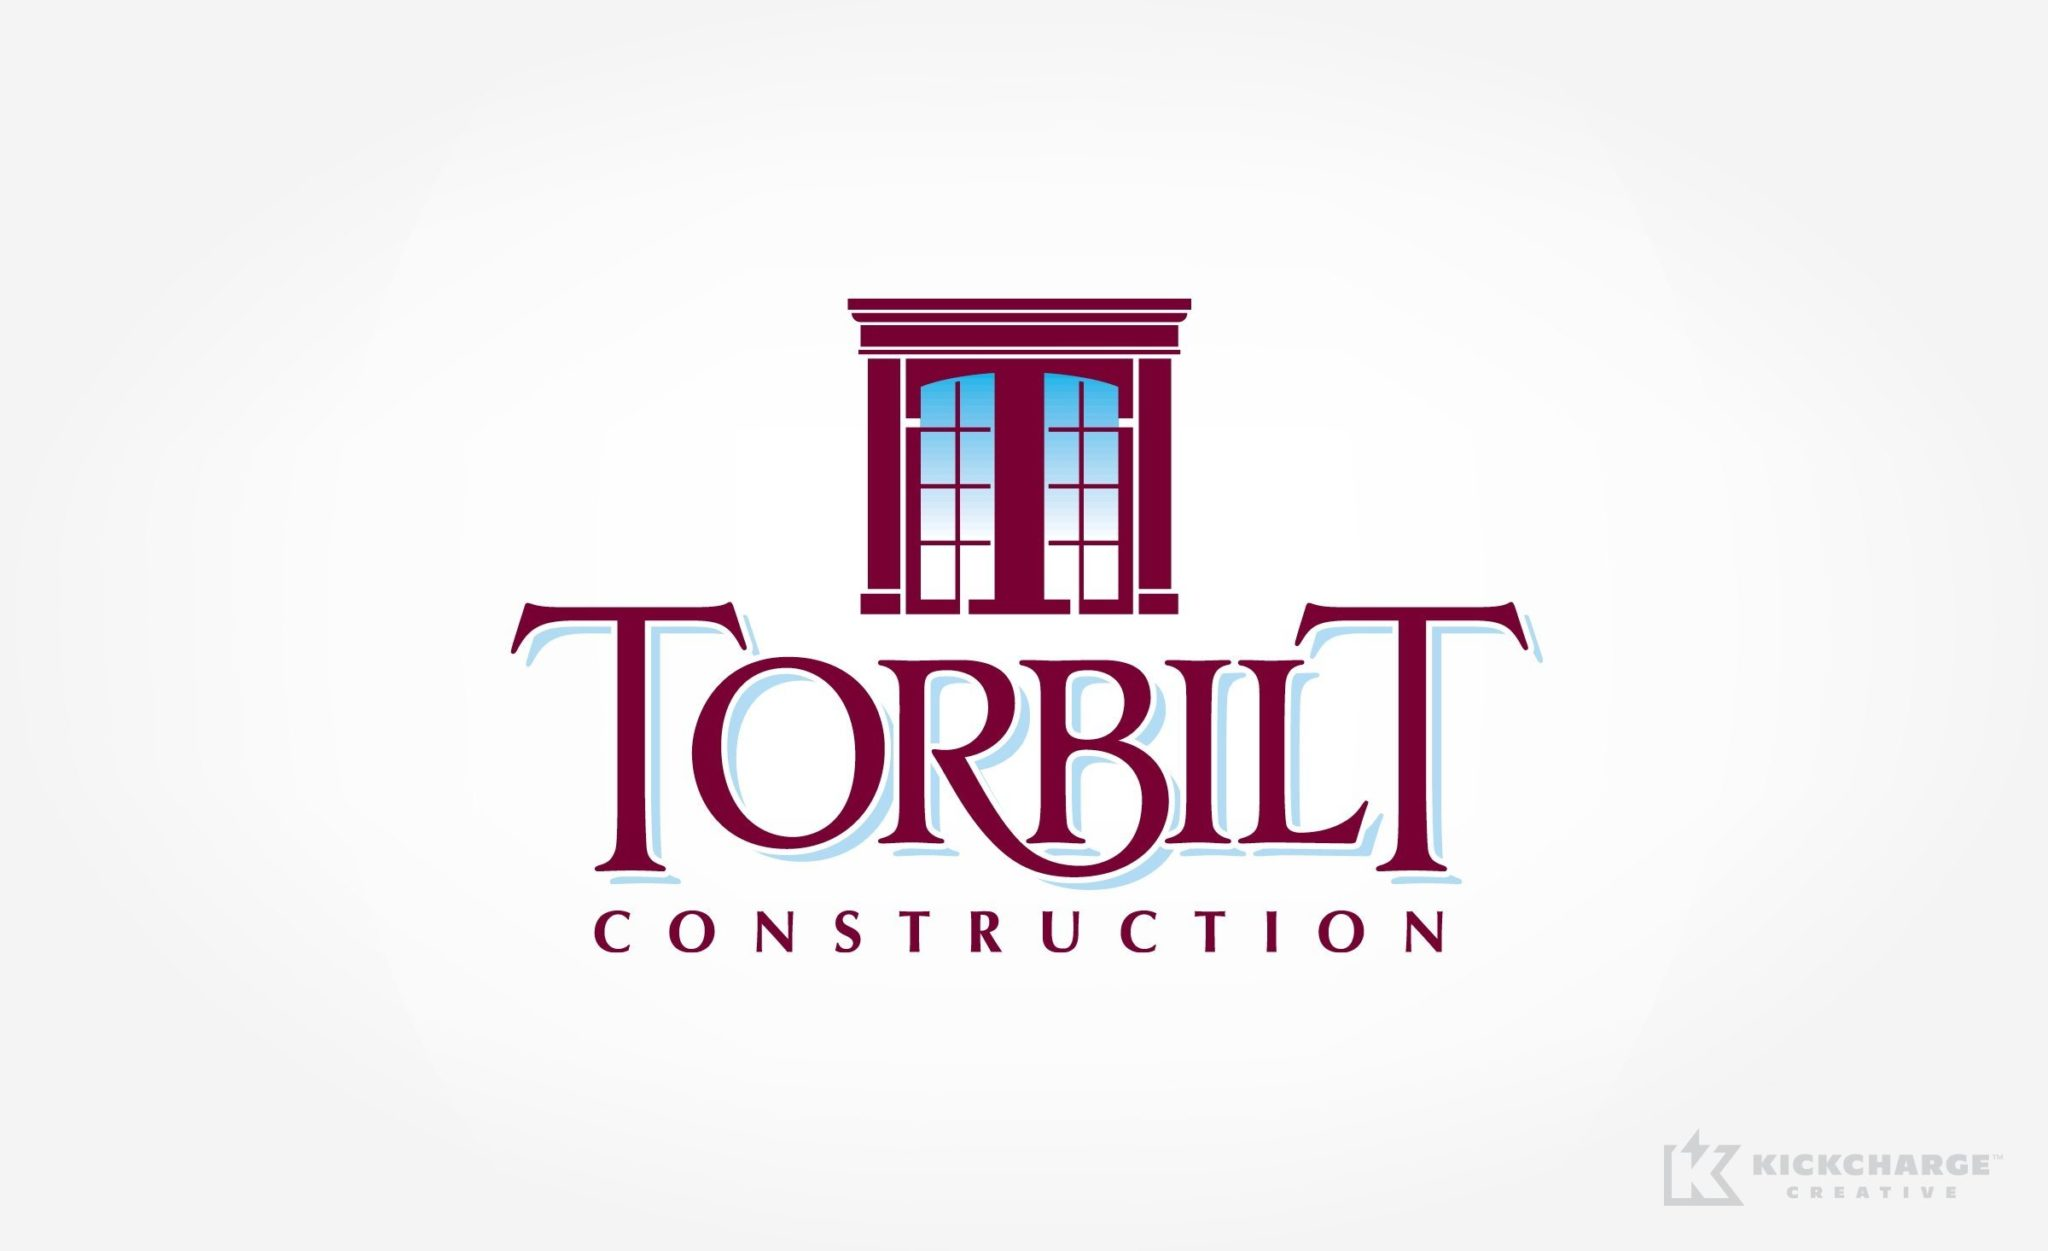 Torbilt Construction